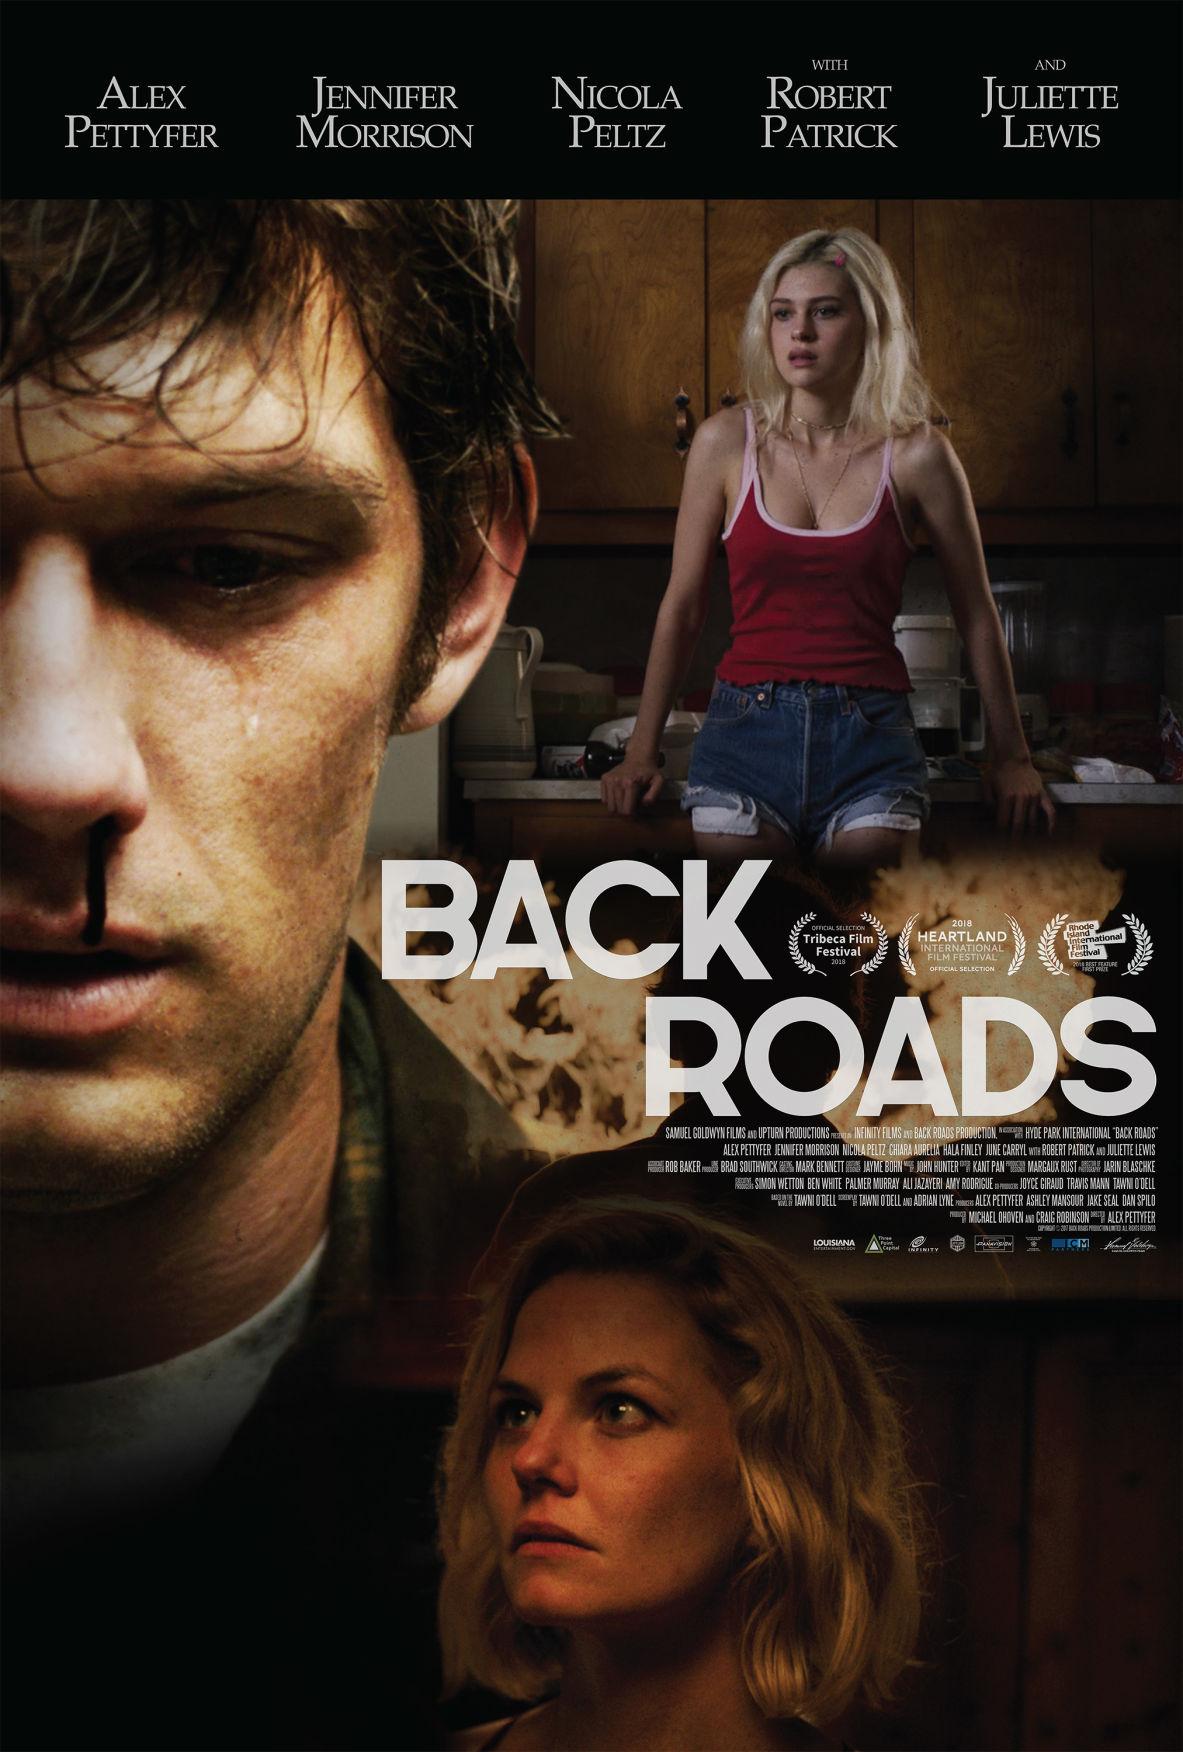 back roads movie minis